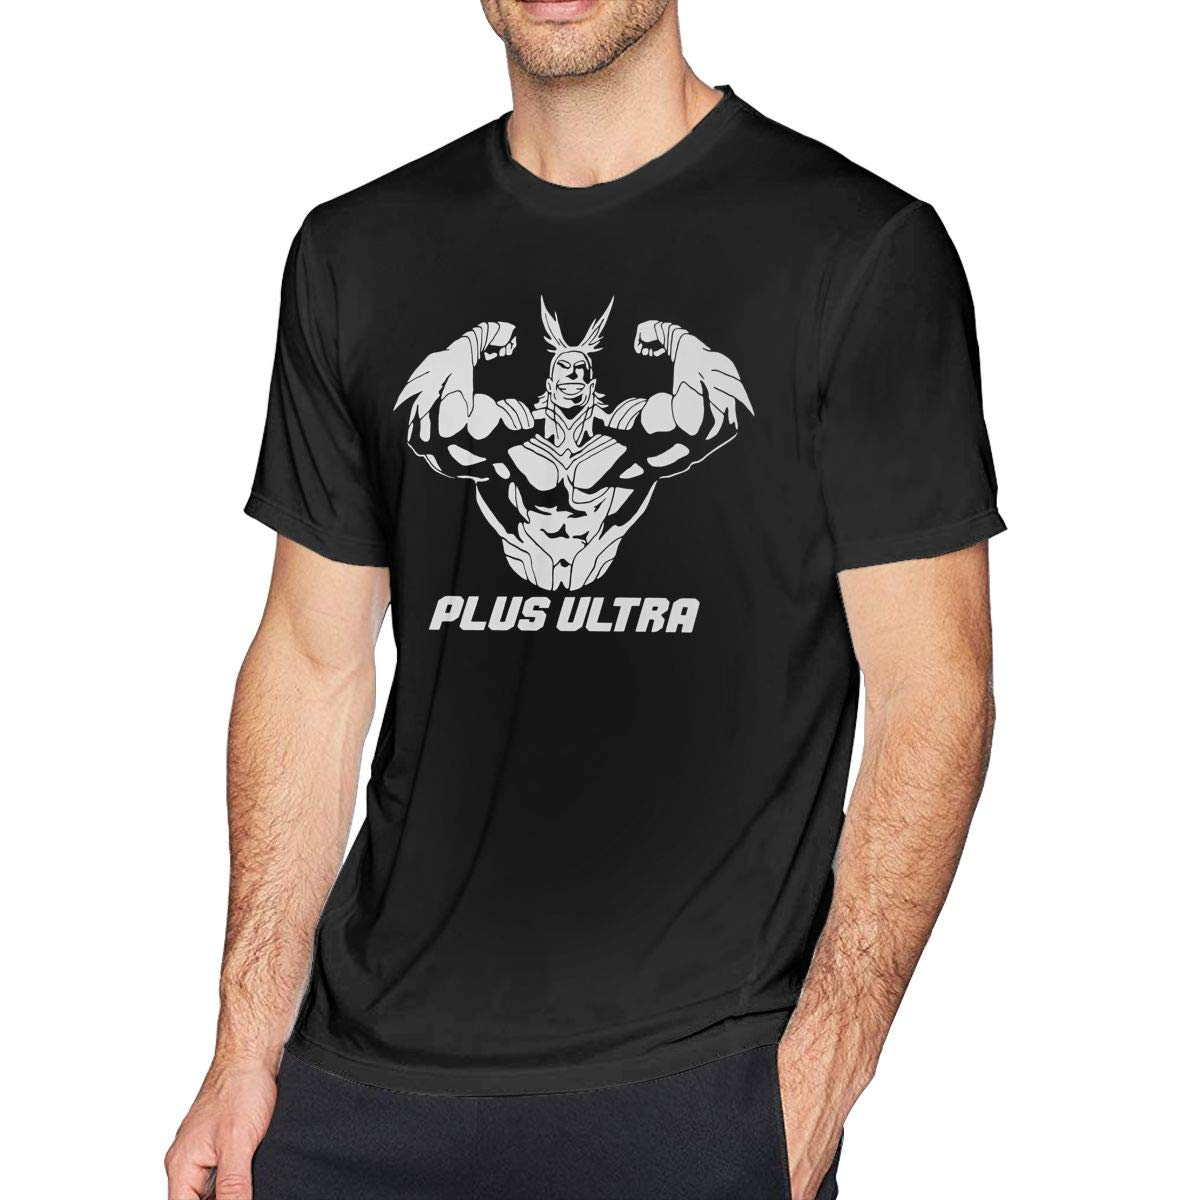 NeedLove Mens Cool My Hero Academia No1 T Shirts Black